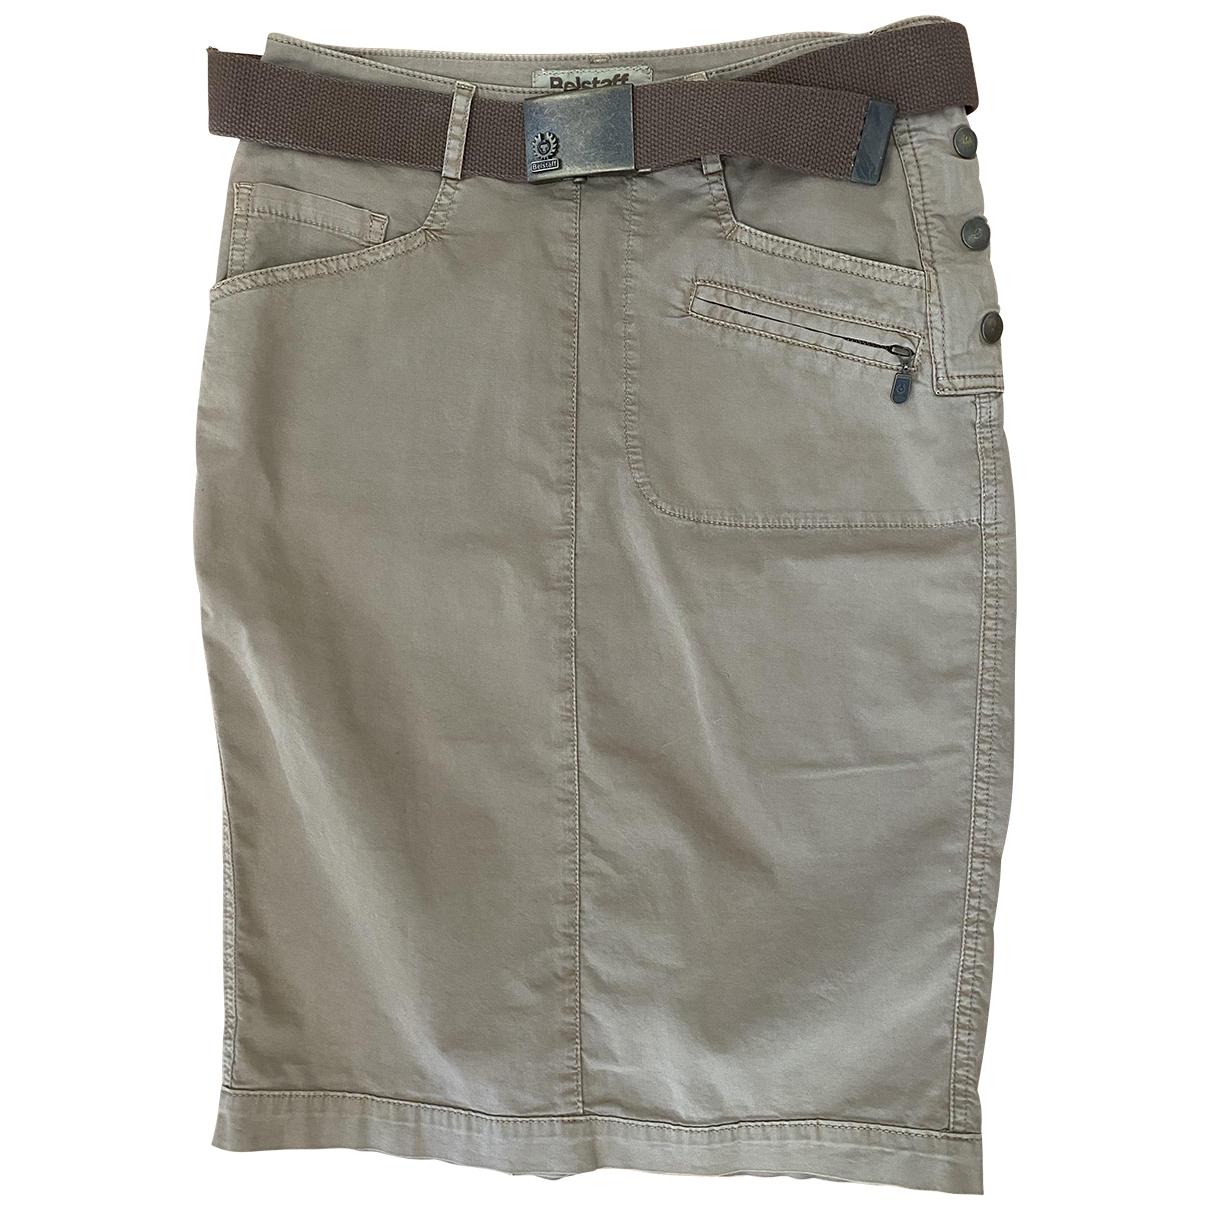 Belstaff \N Beige Cotton - elasthane skirt for Women 40 IT